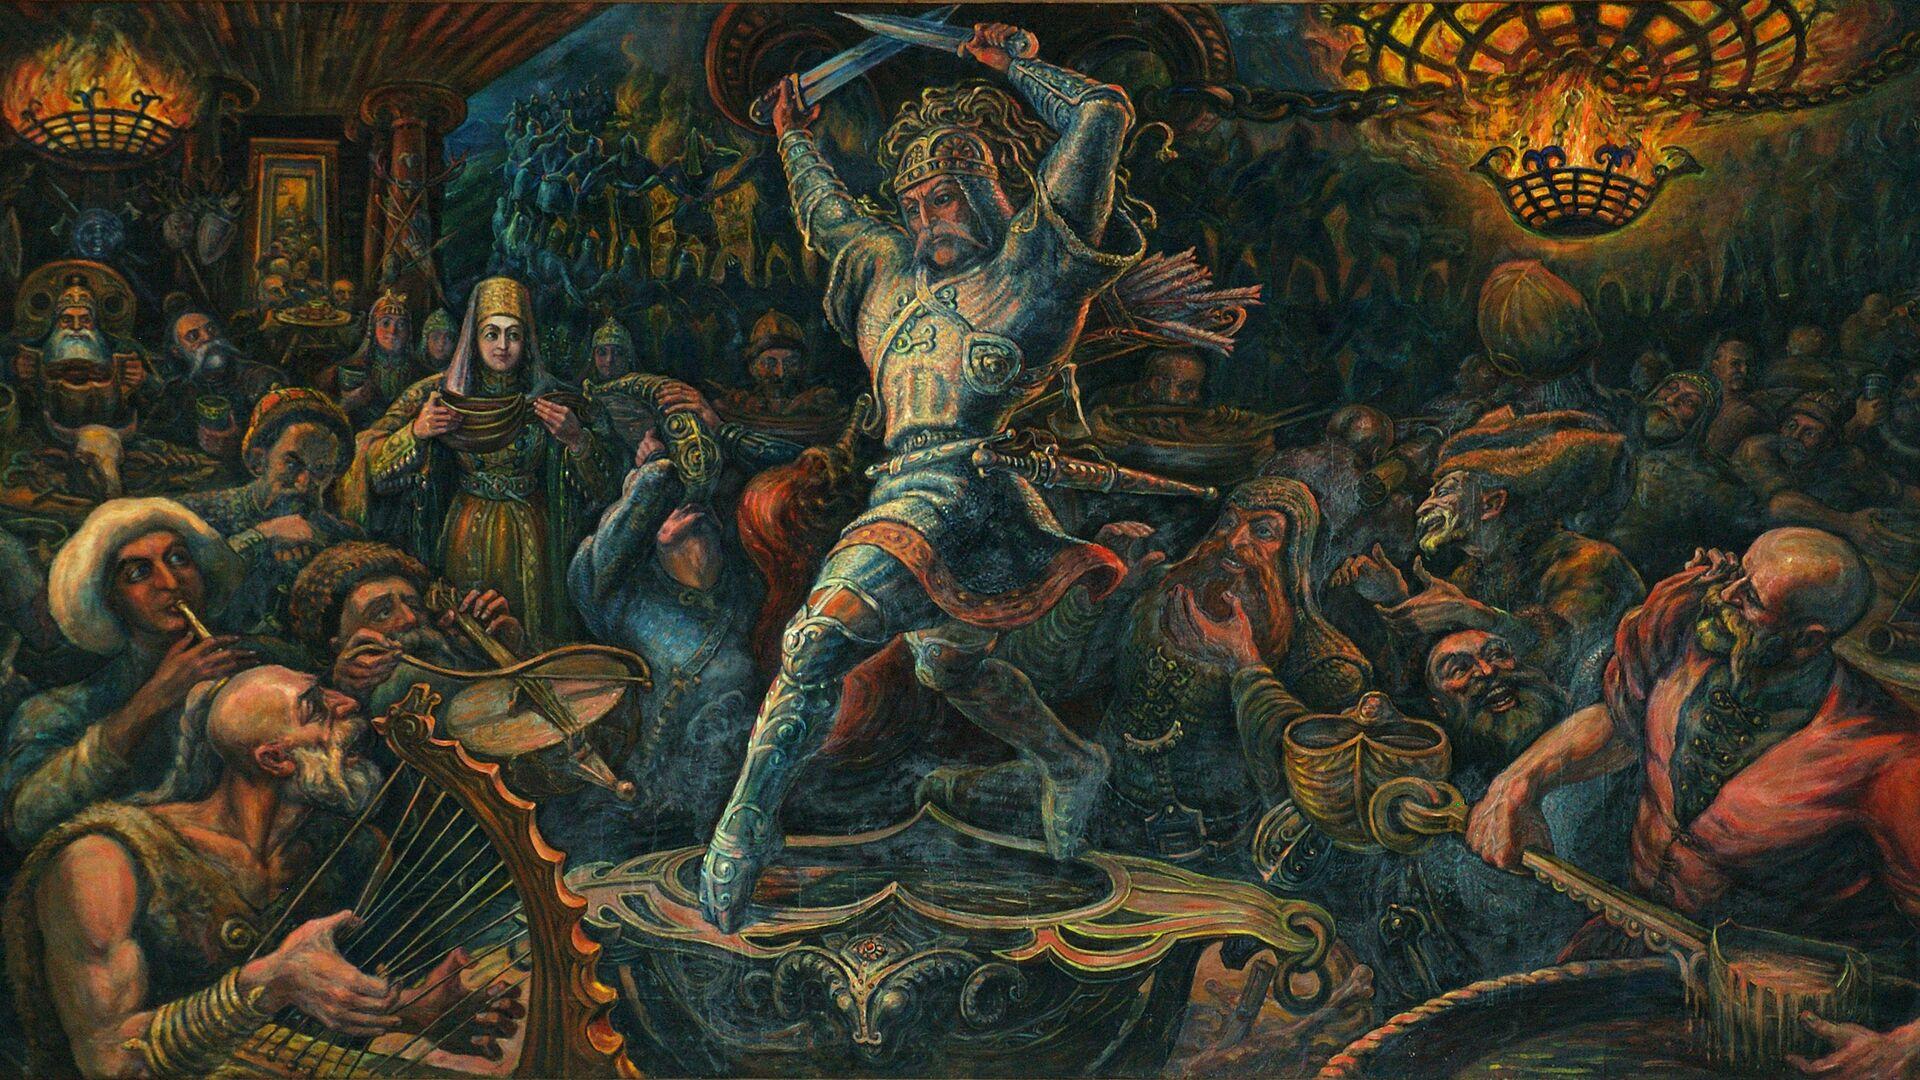 Уӕрӕсейаг специалисттӕ ауадздзысты Цхинвалы лекцитӕ Нарты эпос ӕмӕ фӕсивӕдон проблӕматыл - Sputnik Хуссар Ирыстон, 1920, 12.10.2021